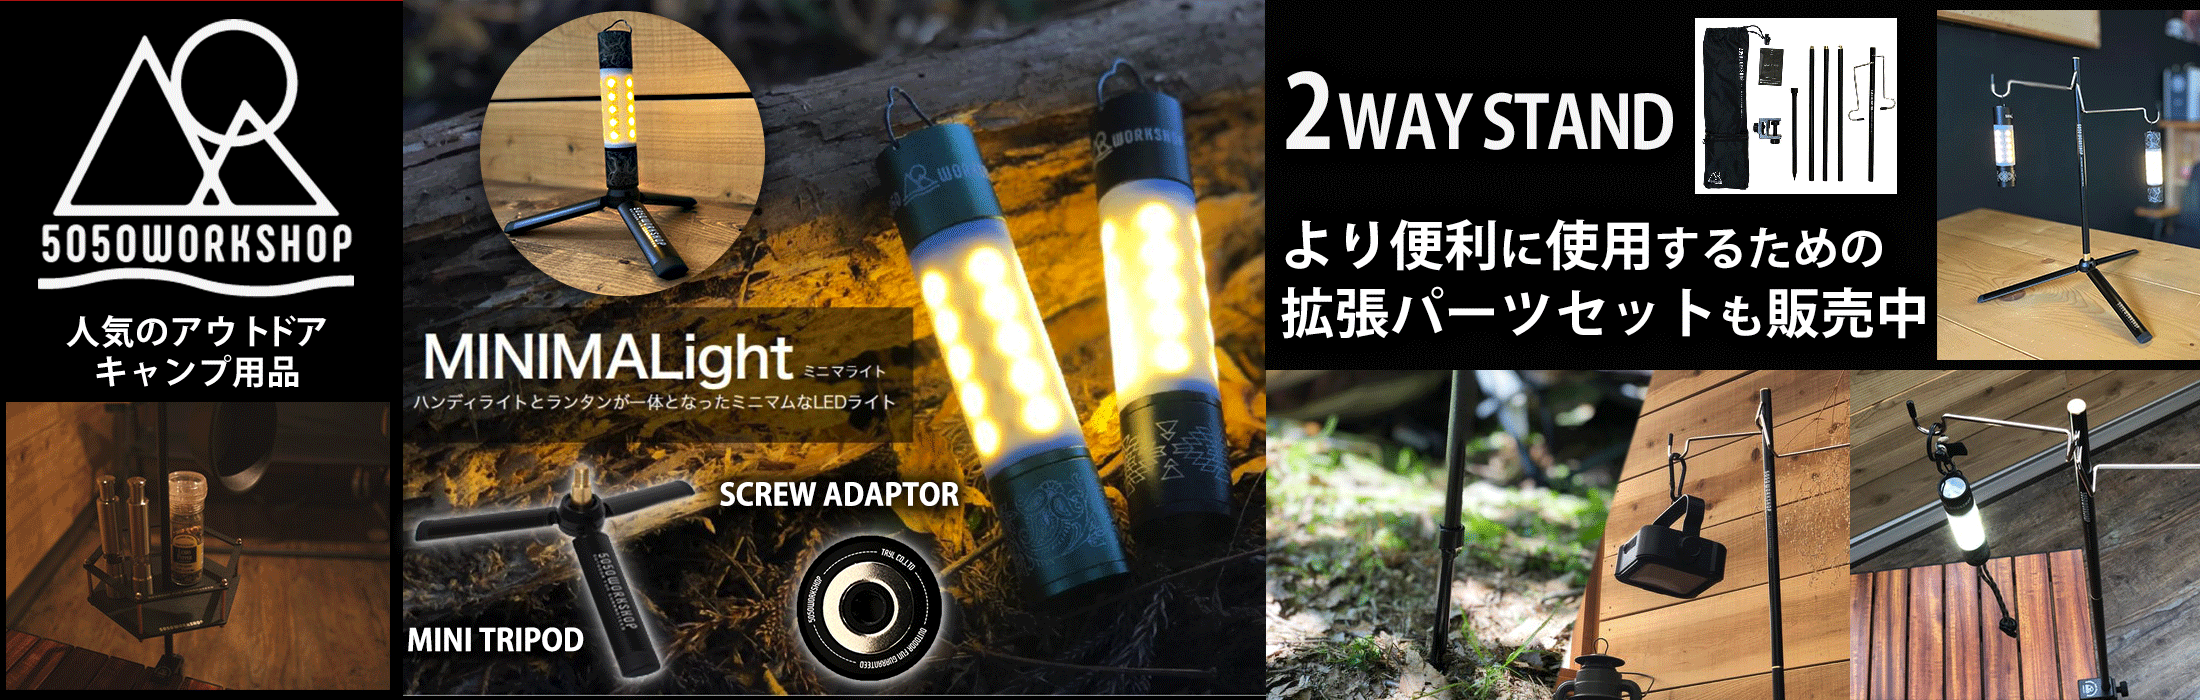 godblinc バイク用ヘルメット 送料無料!